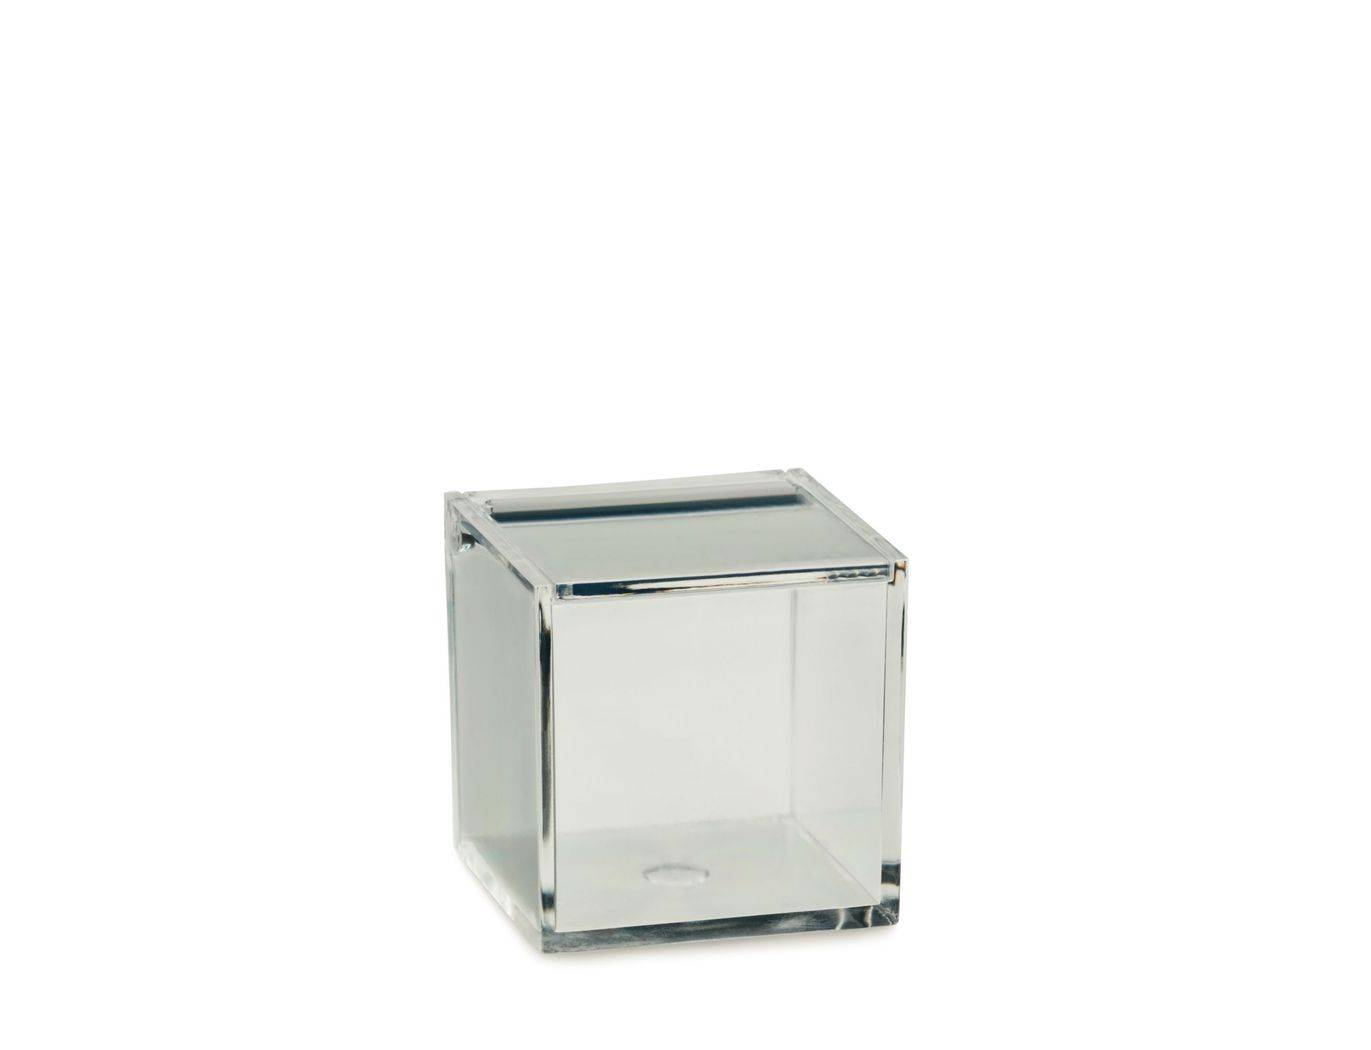 Kosmetická dóza SAFIRA plast, transparent, 6x6x6cm - Kela